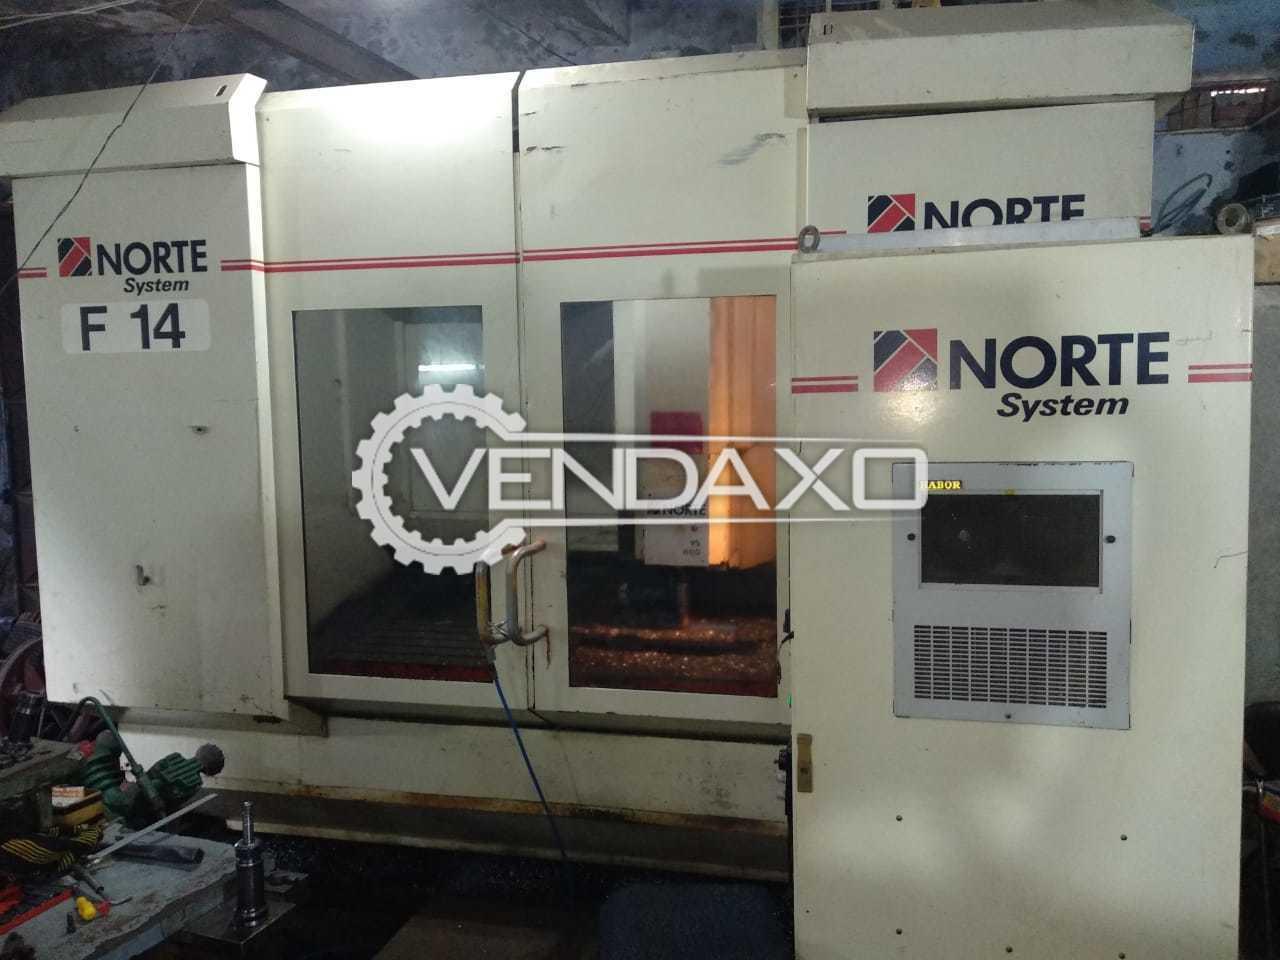 NORTE Make VS 500 CNC Vertical Machining Center - Table Size - 2000 x 500 mm